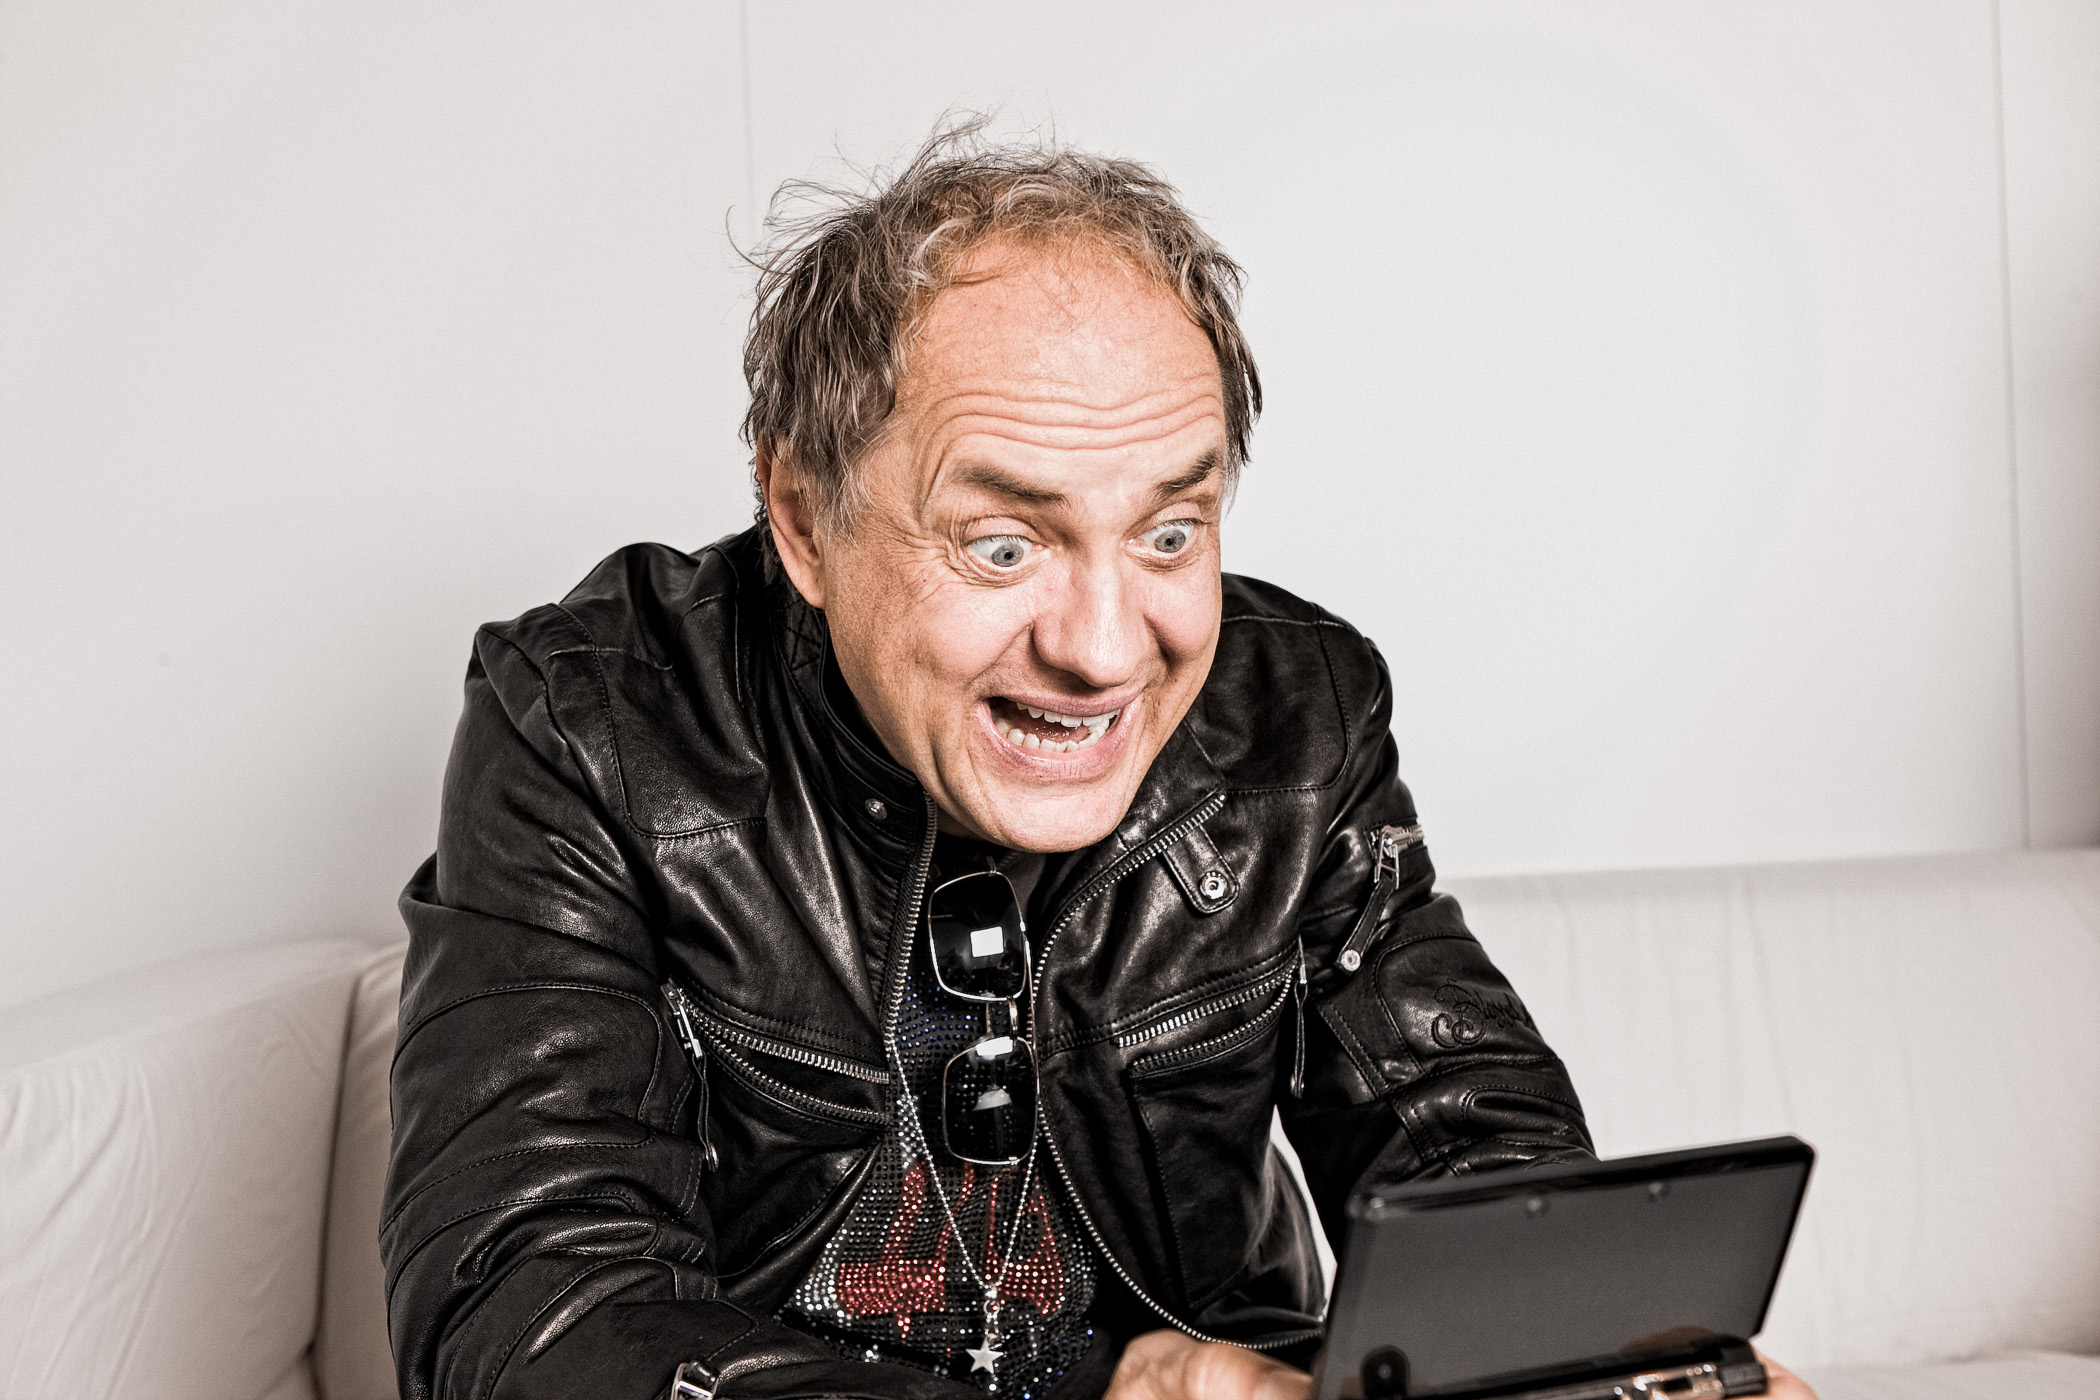 Uwe Ochsenknecht, Schauspieler, Florian Kresse, Fotograf, Peoplefotografie, Portrait, Actor, Imagekampagne